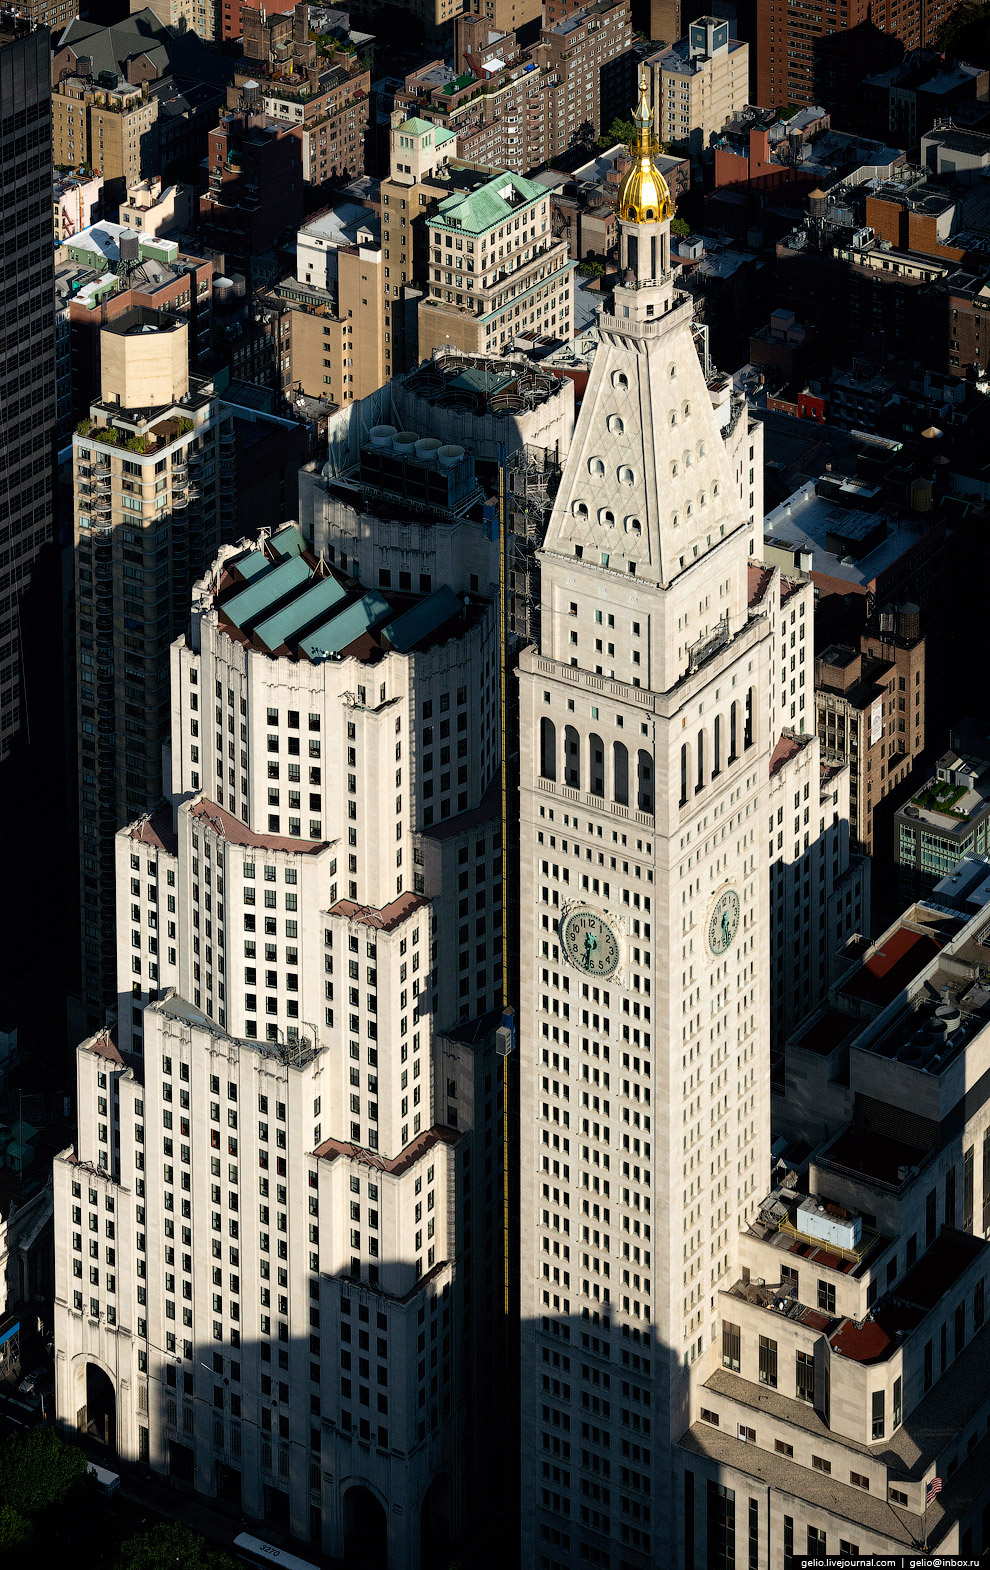 МетЛайф Тауэр (Metropolitan Life Tower)